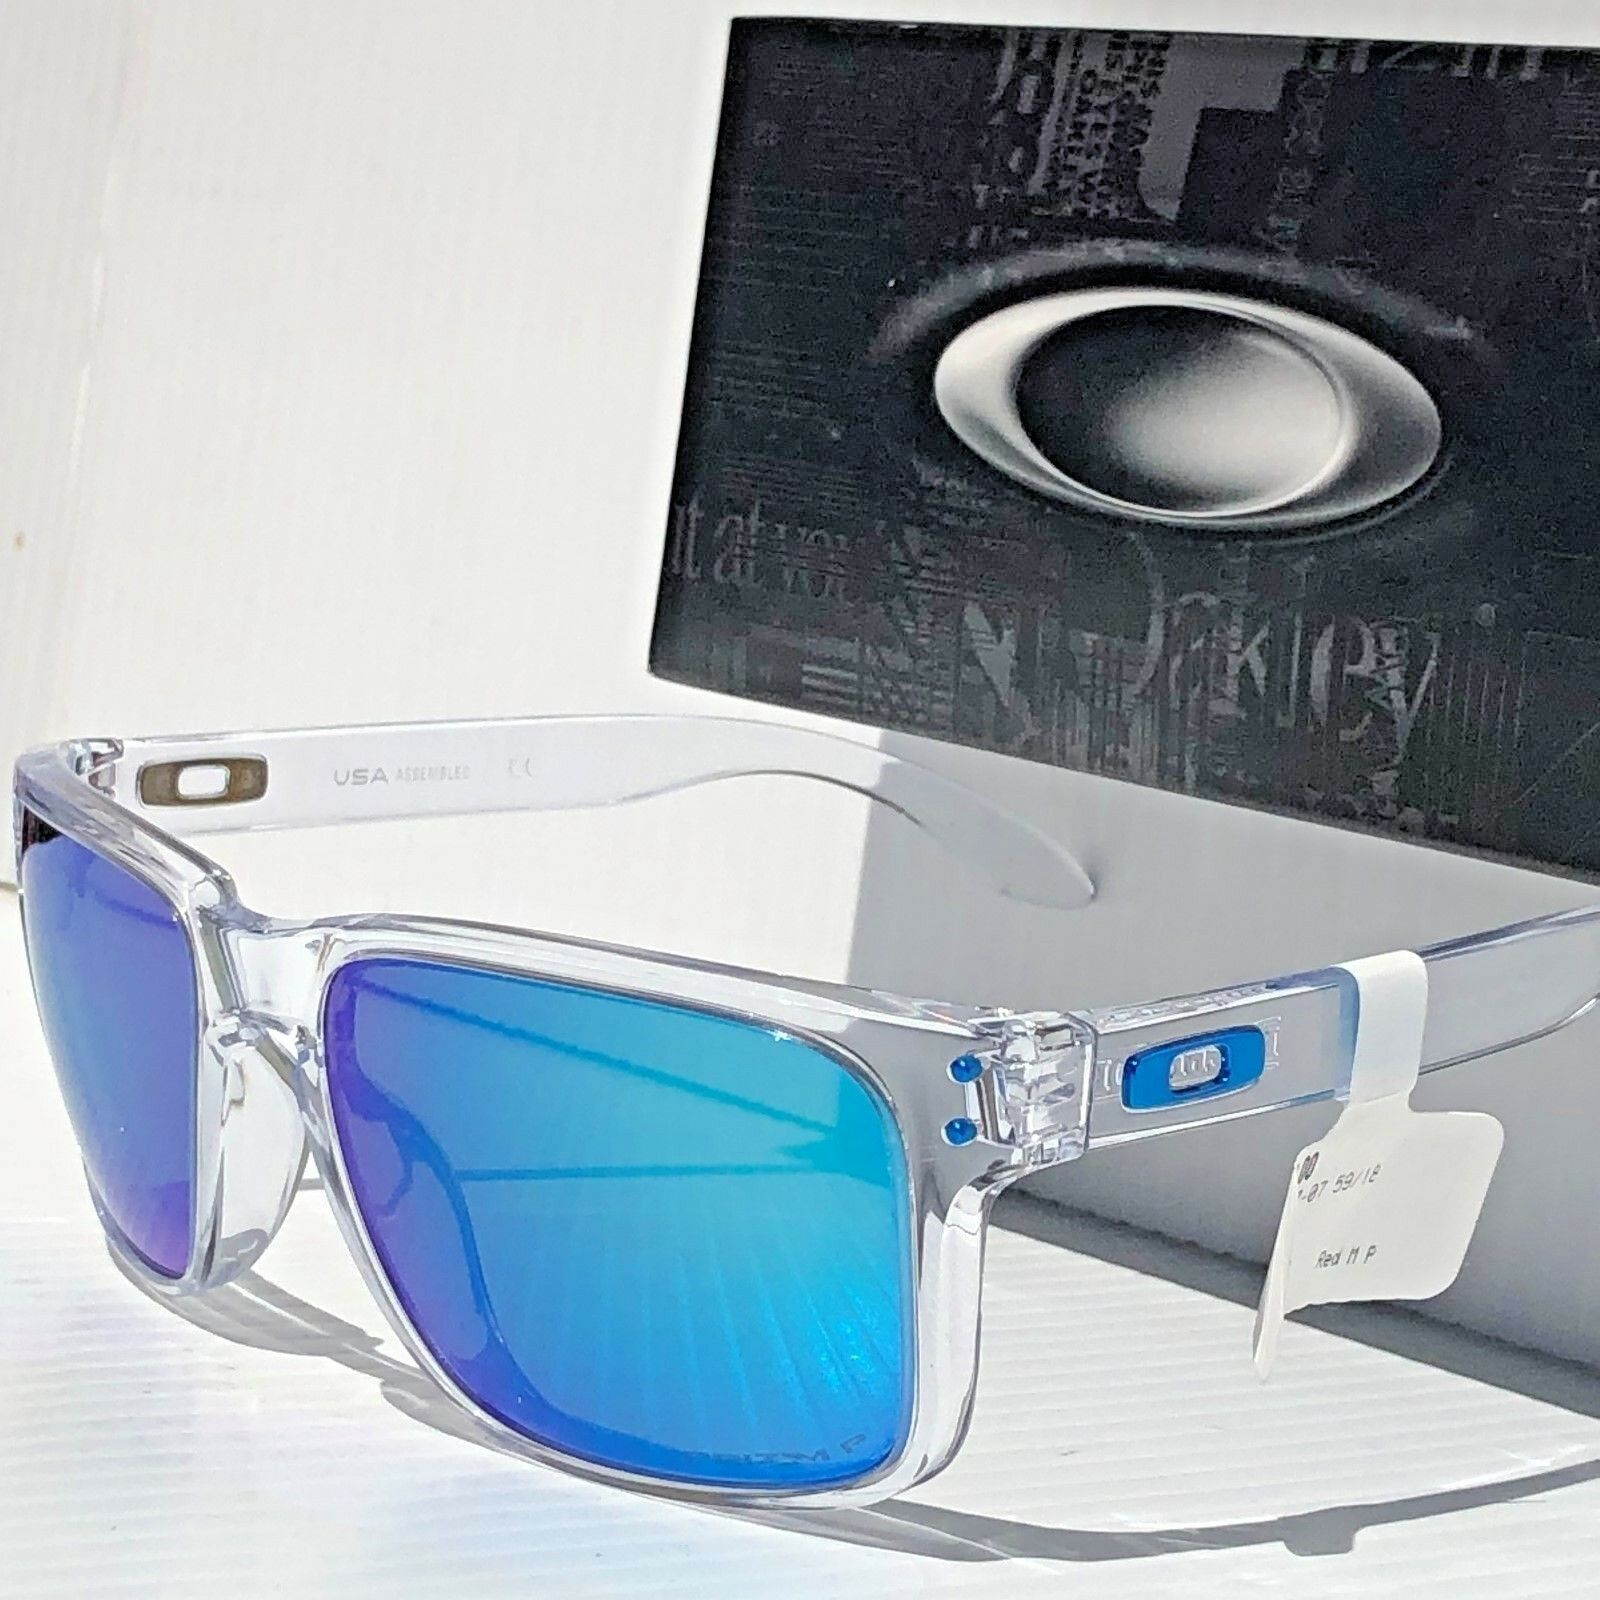 978dc86750 Oakley Holbrook Polished Clear Sapphire Iridium Prizm Polarized Lens XL  Oo9417 for sale online